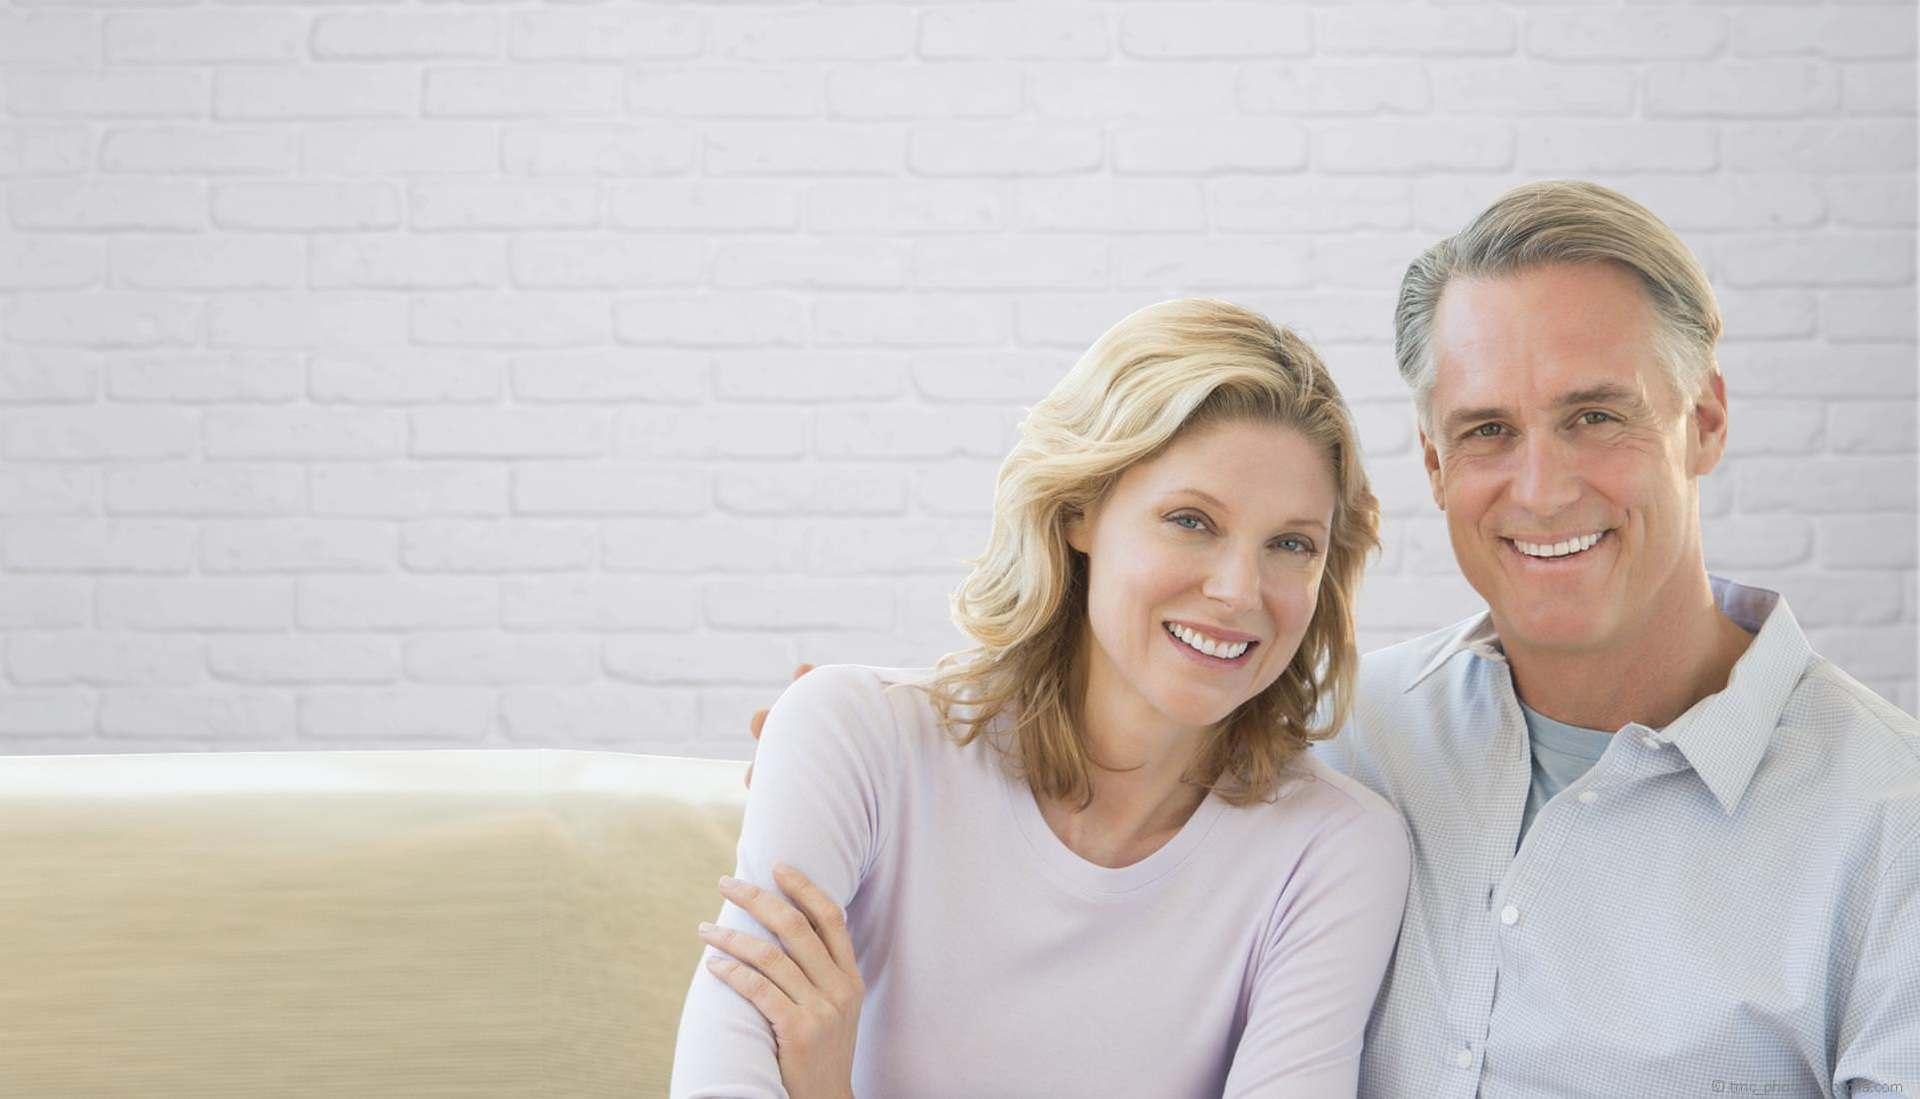 Zahnarzt Paar Bringt Eigene Kinder Um